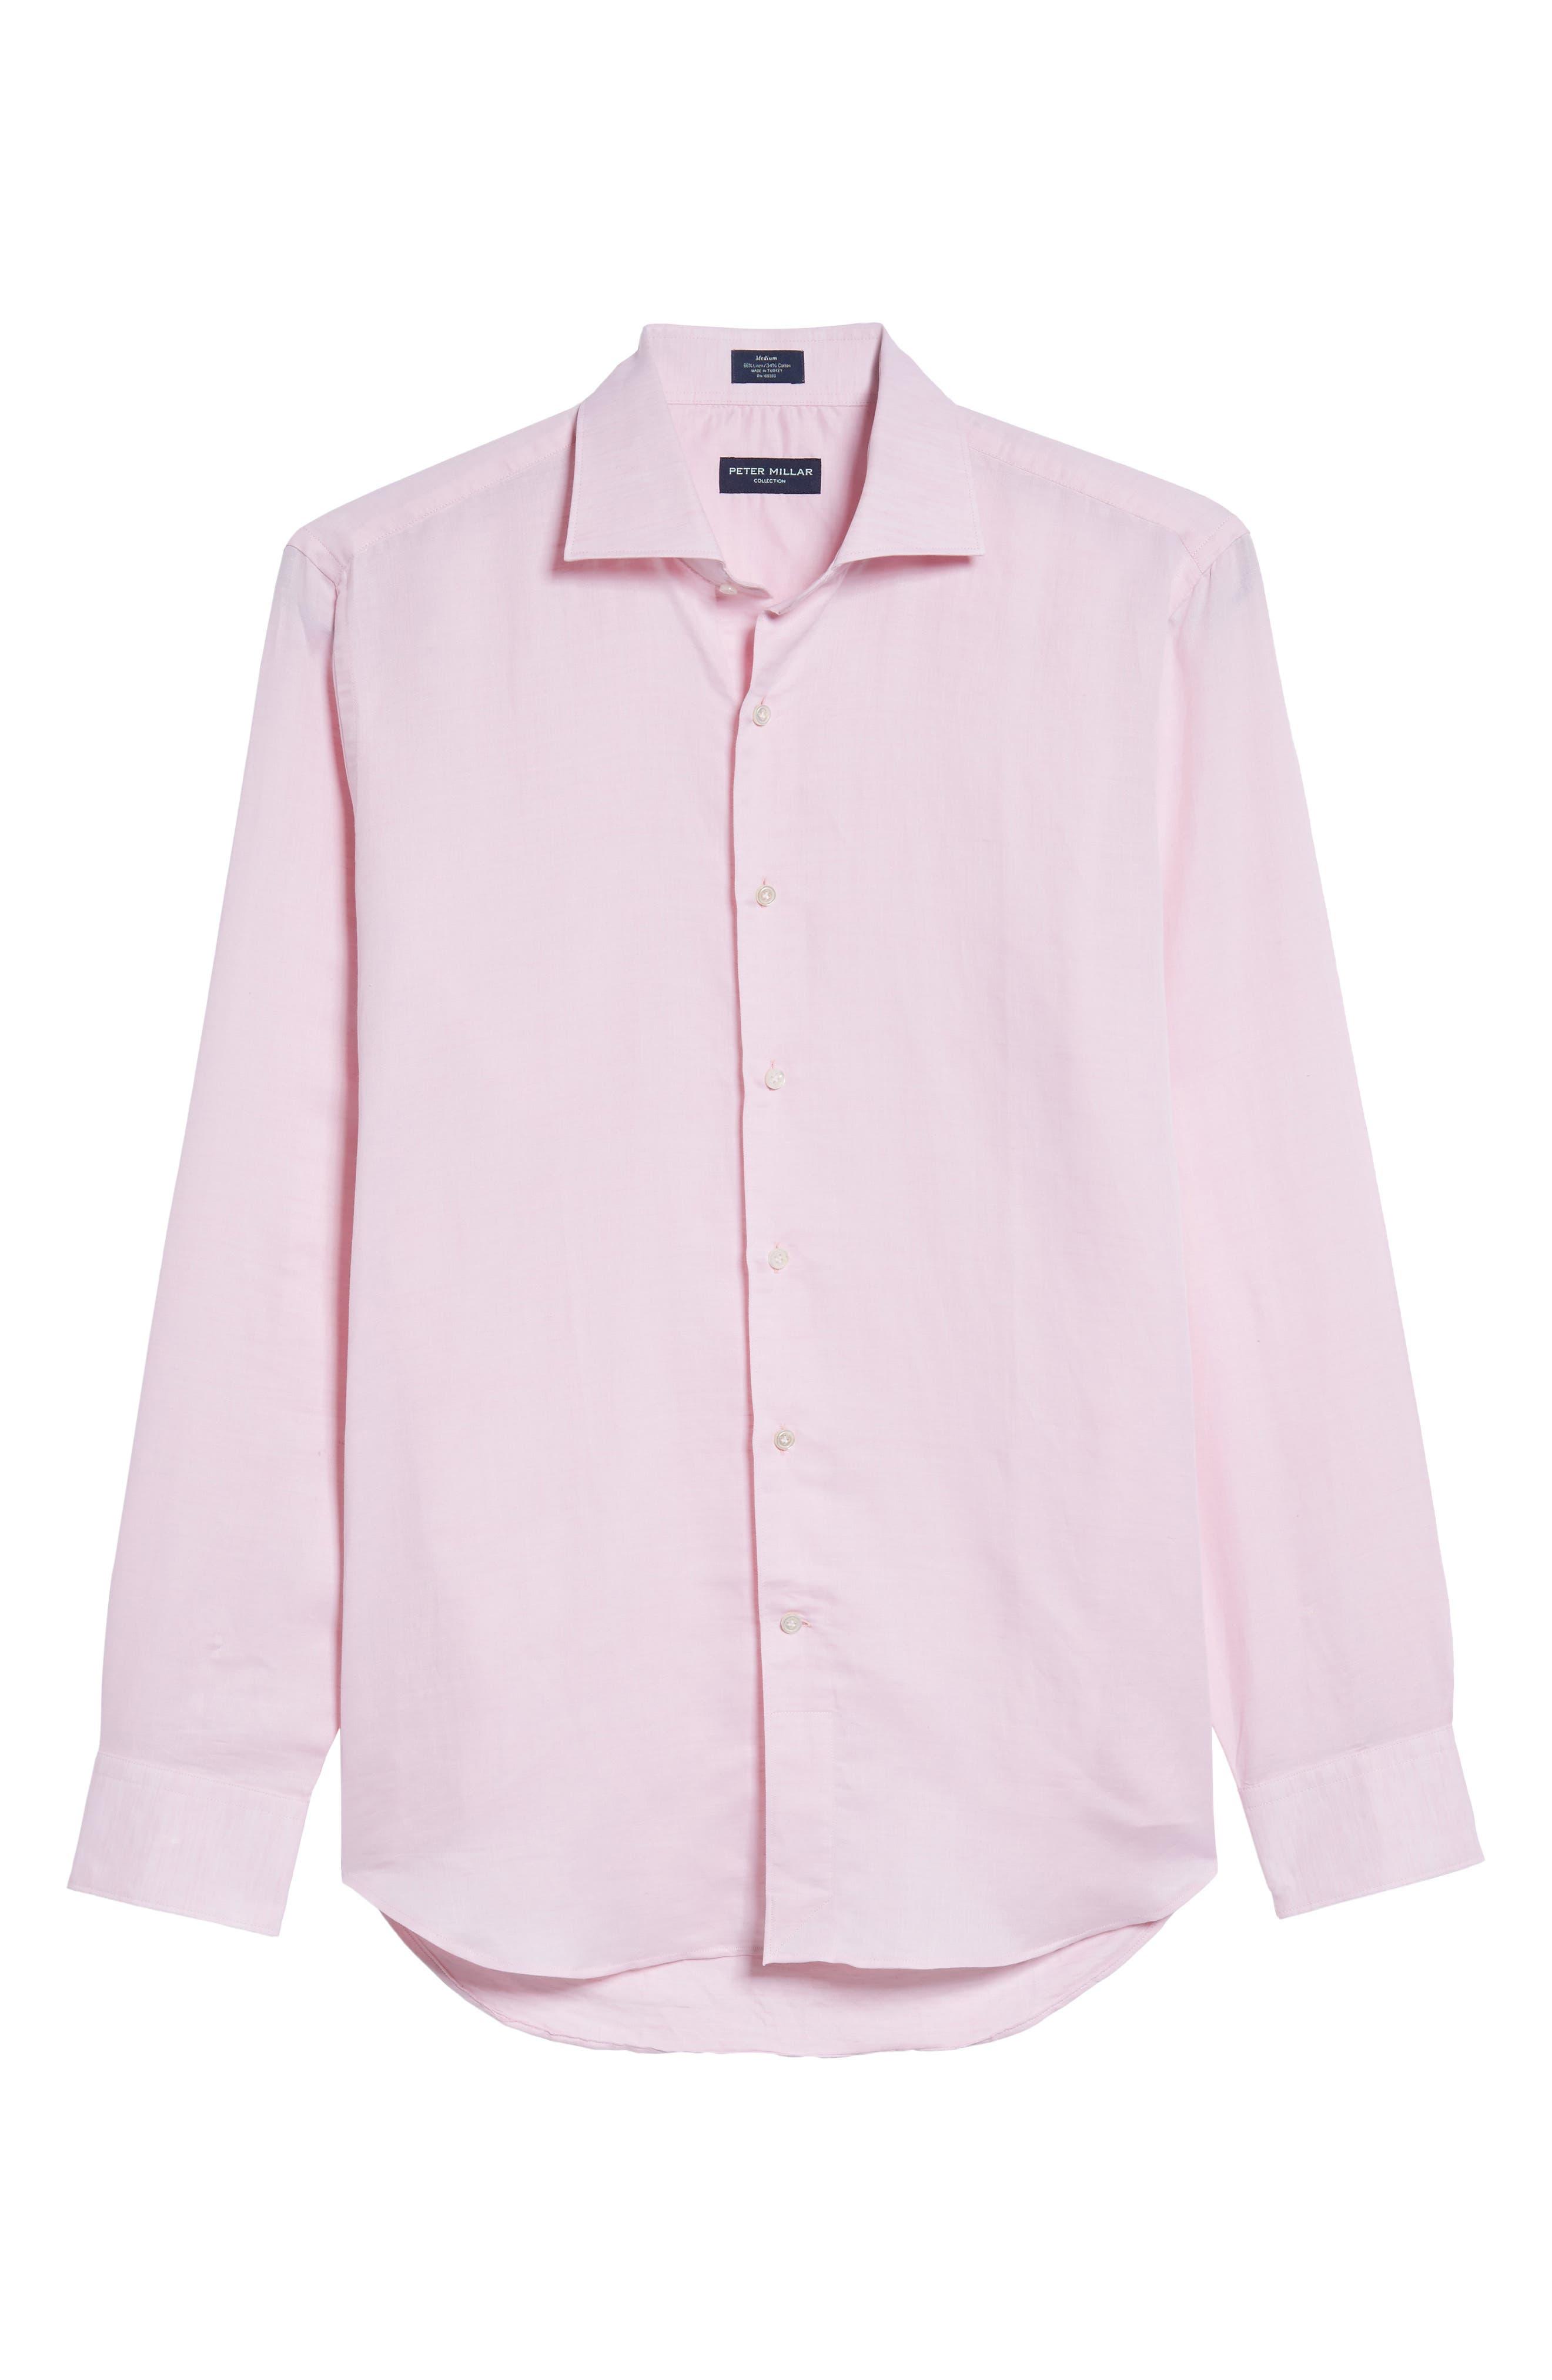 PETER MILLAR COLLECTION,                             Linen & Cotton Sport Shirt,                             Alternate thumbnail 6, color,                             626